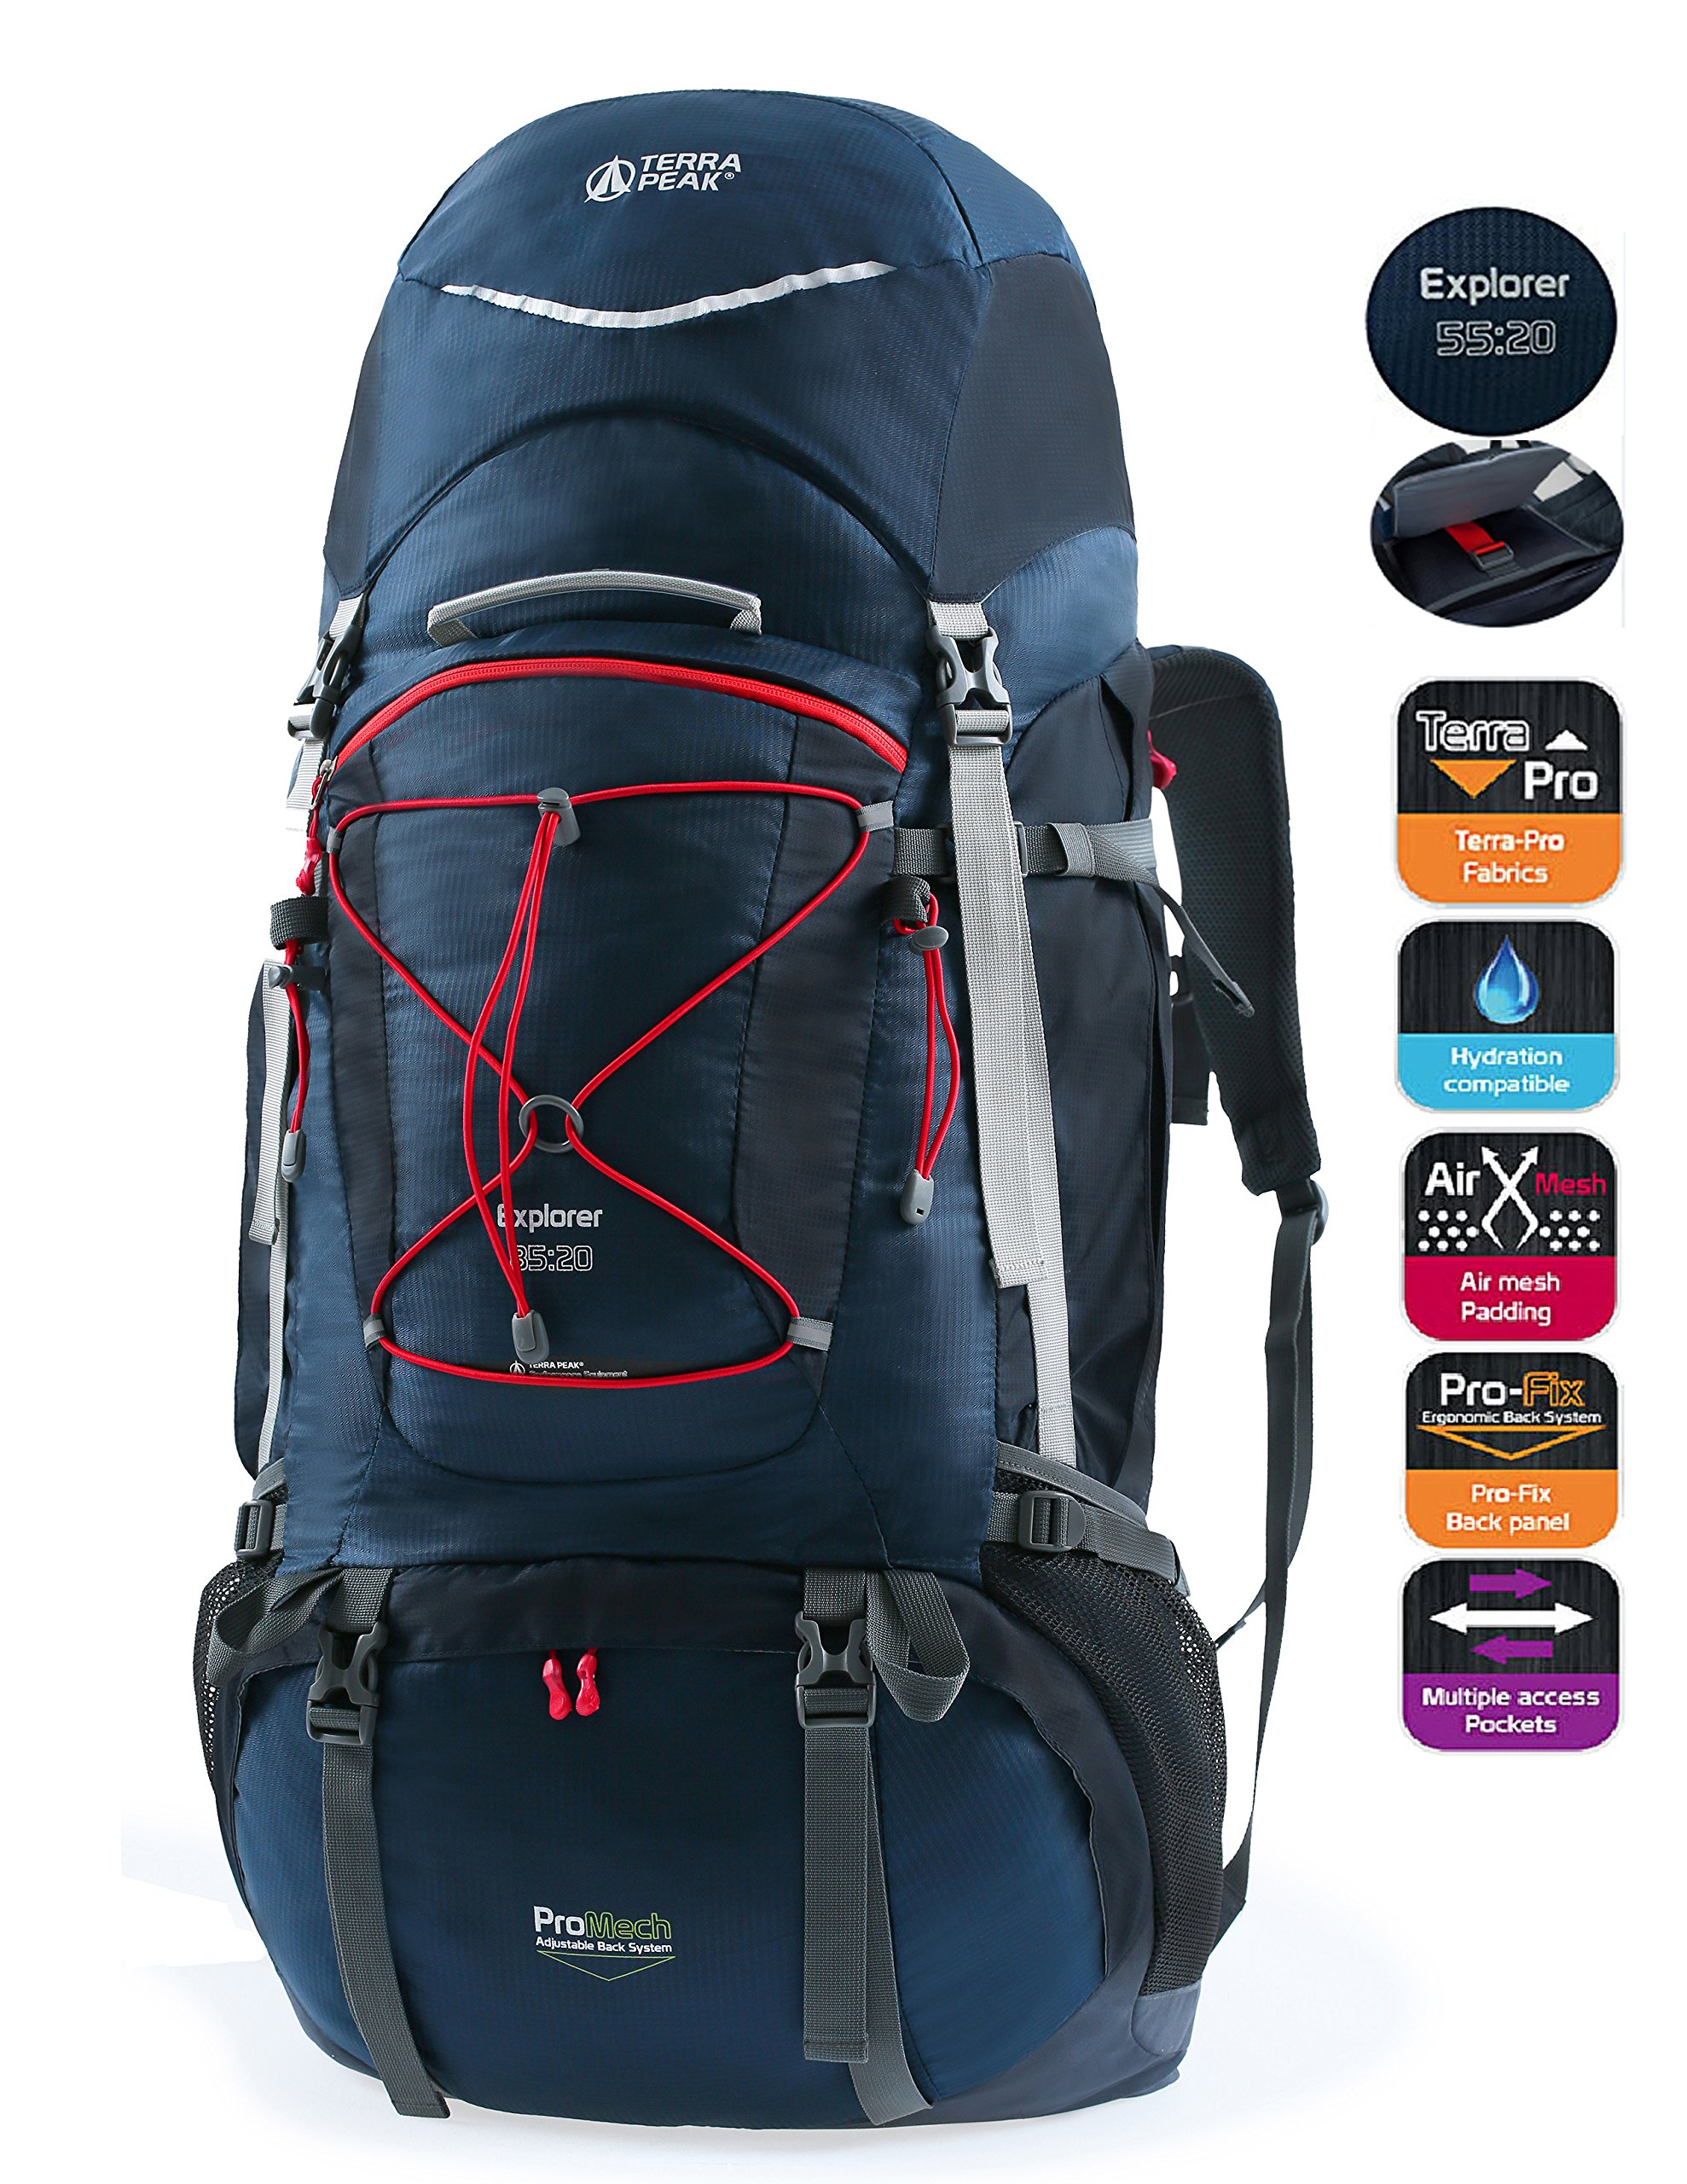 TERRA PEAK Adjustable Hiking Backpack 55L+20L for Men Women With Free Rain Cover Included Navy by TERRA PEAK